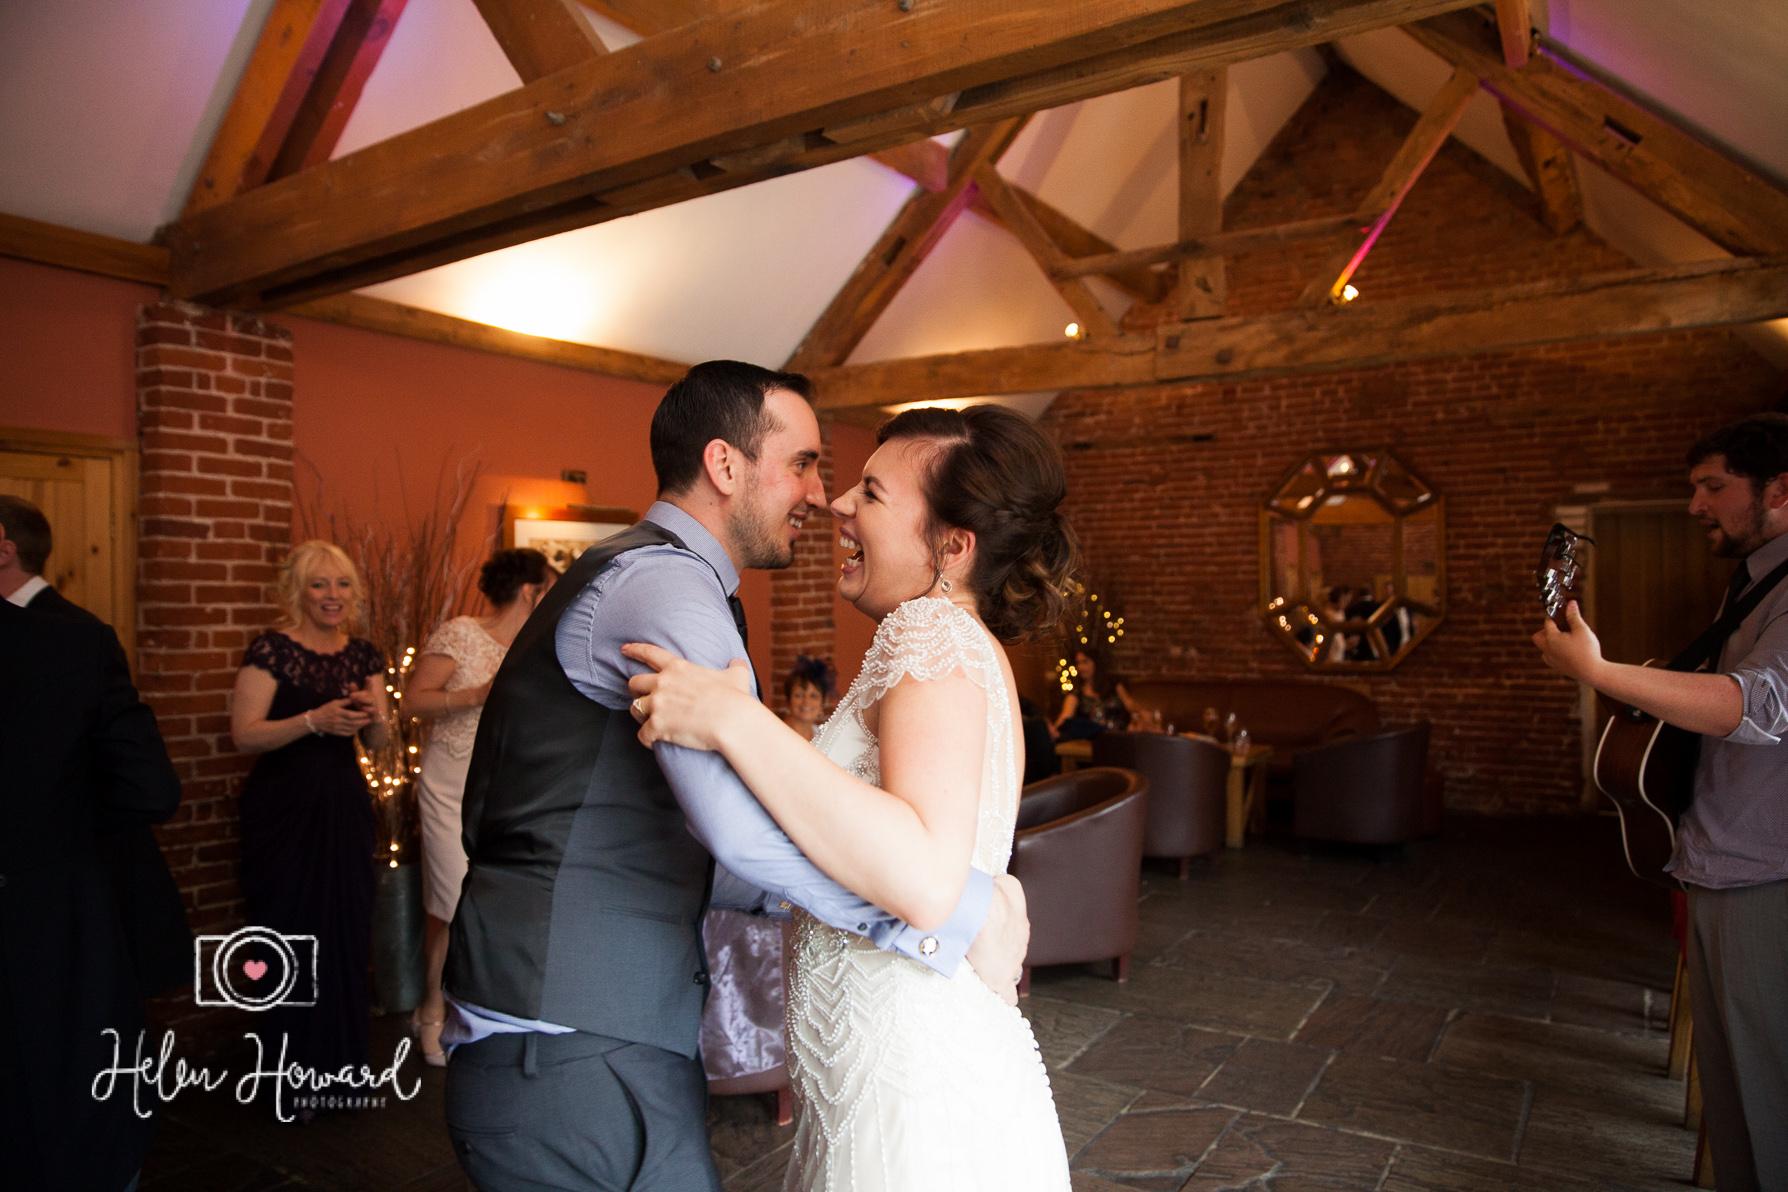 Helen Howard Photography Packington Moor Wedding-115.jpg